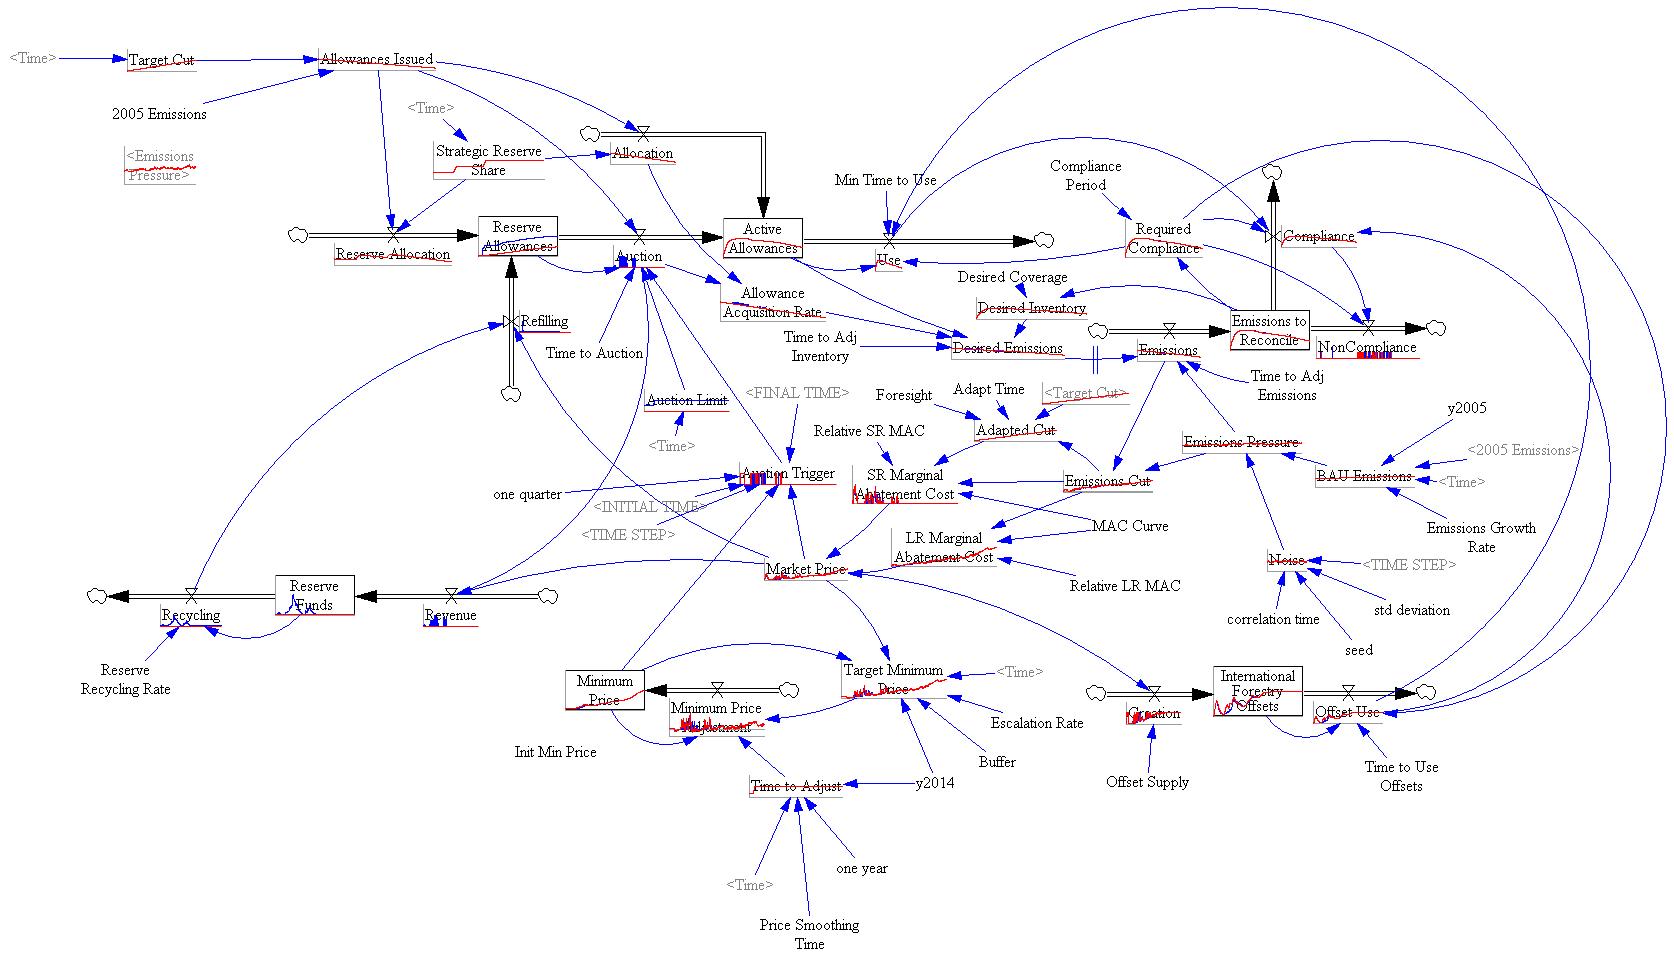 Strategic reserve structure